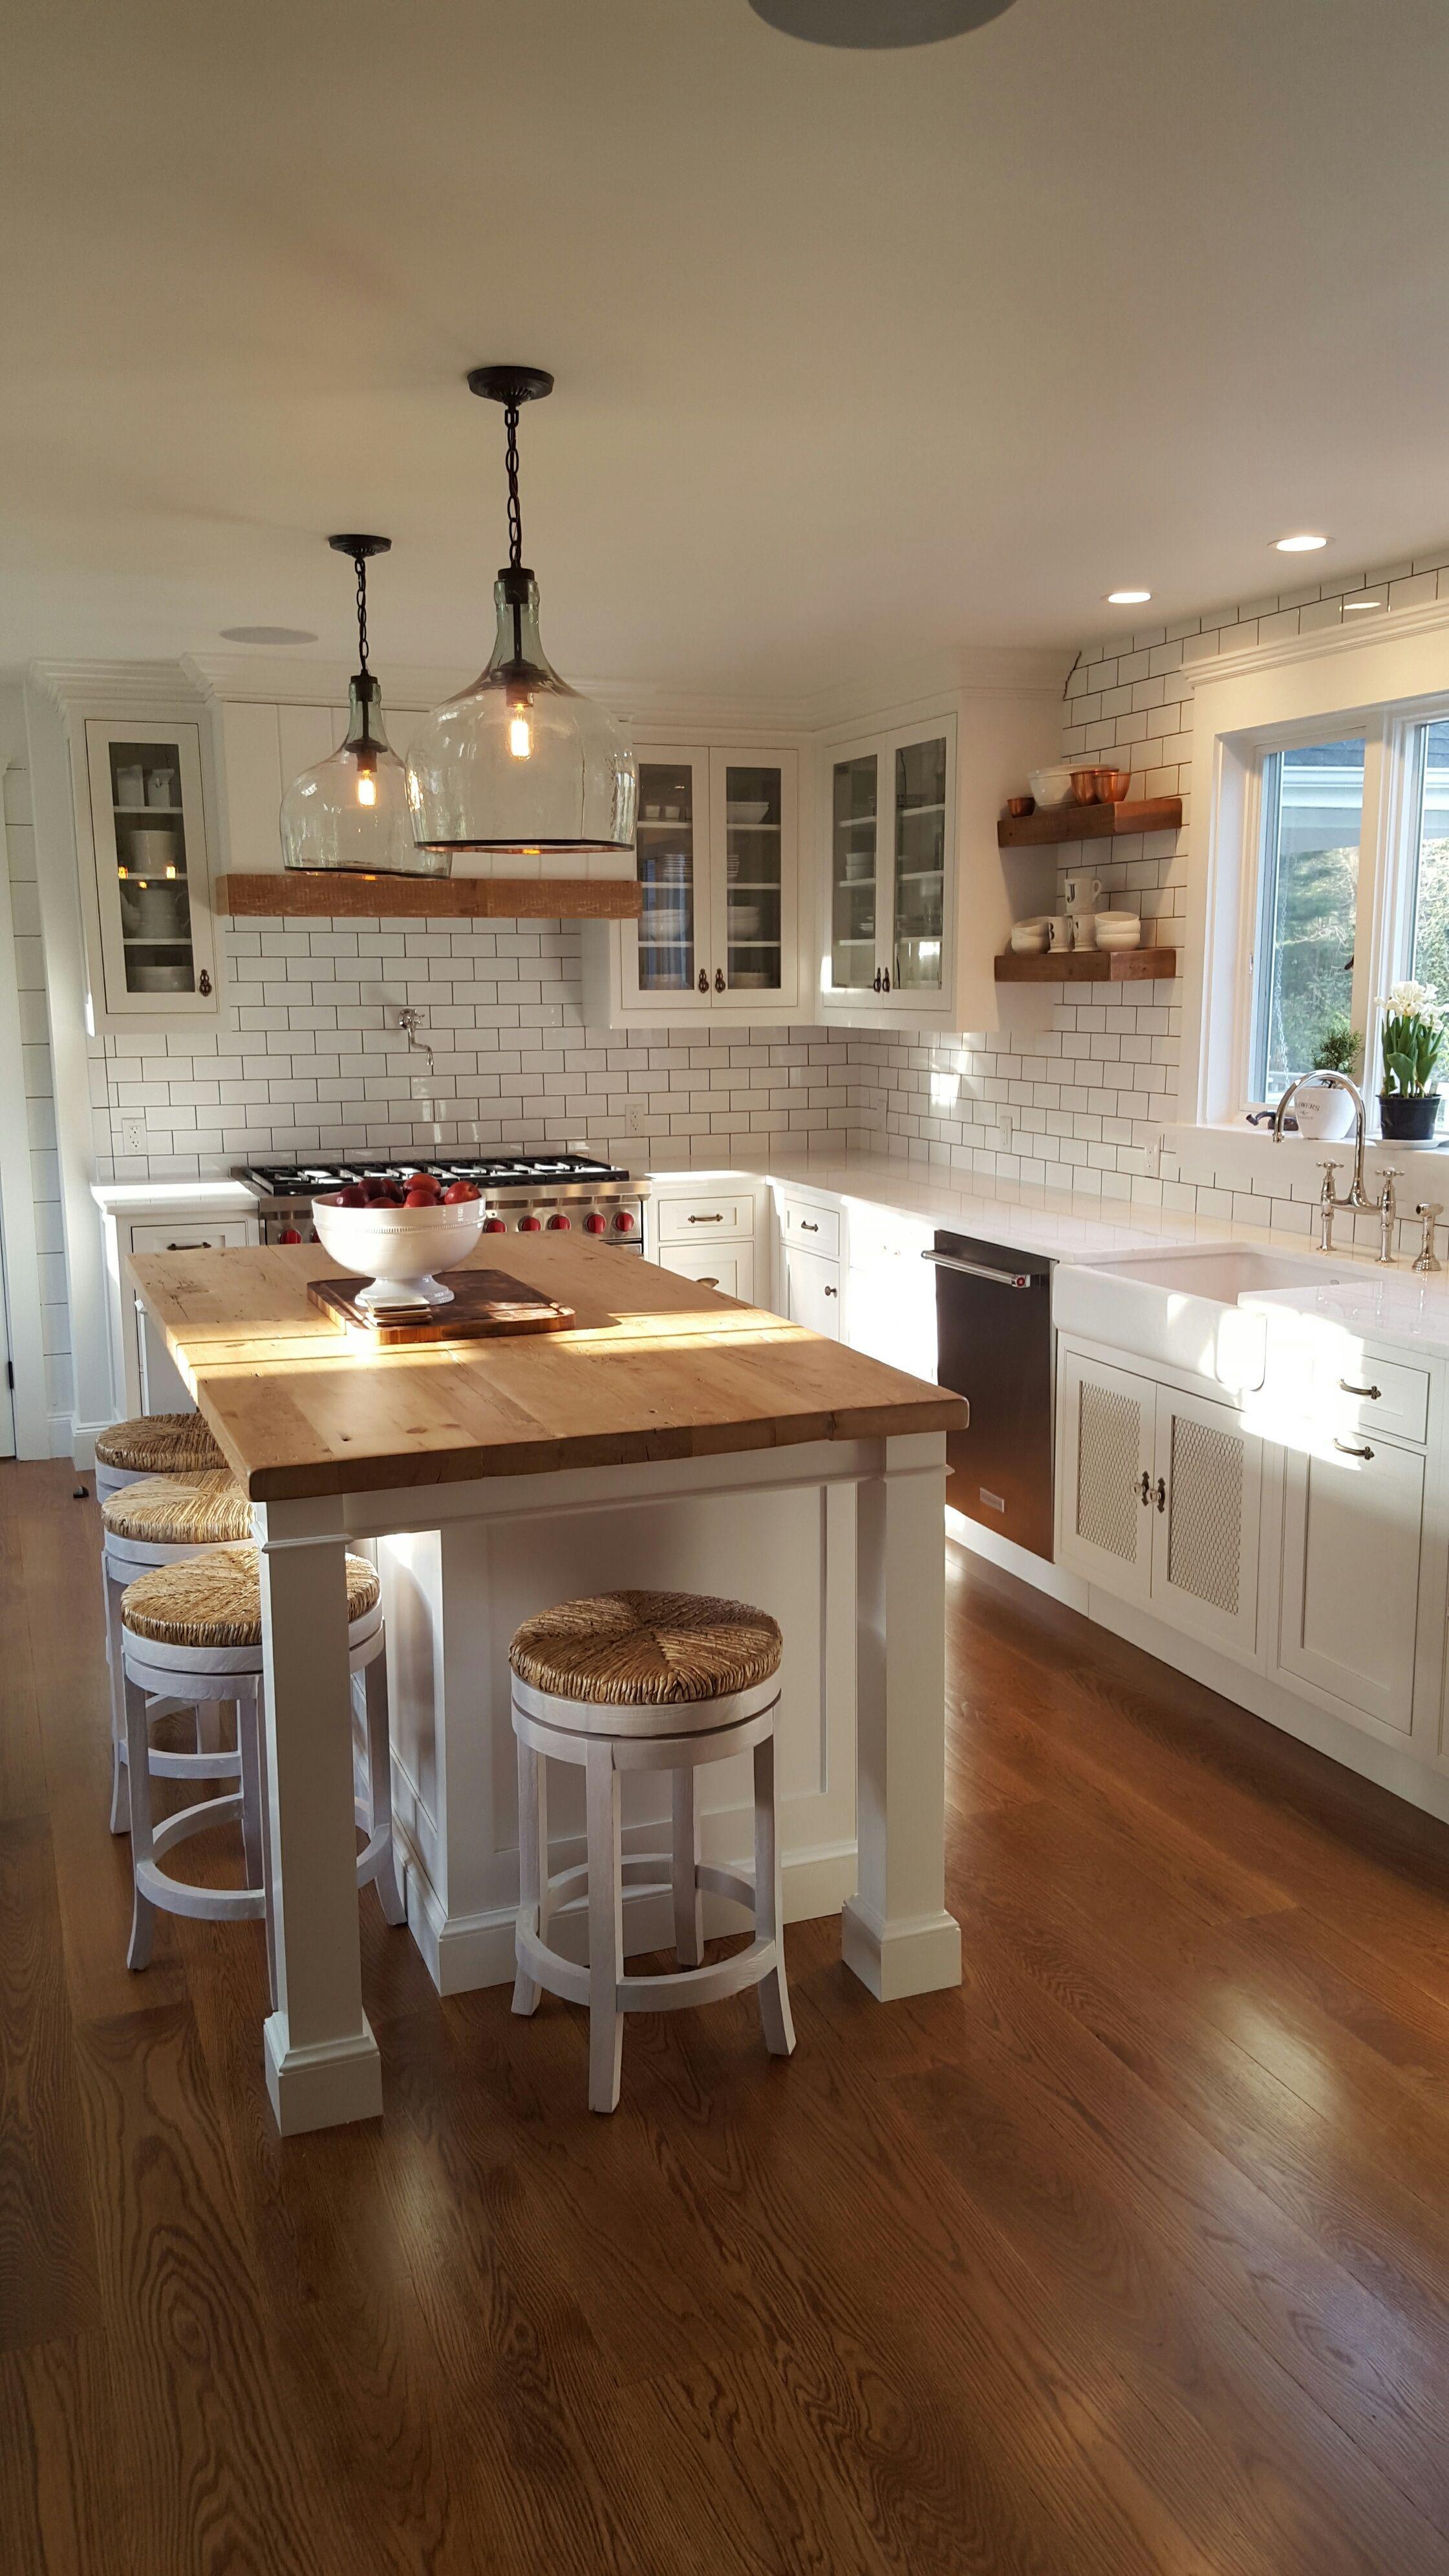 reclaimed barnwood island top, hood trim & shelves provided by ...